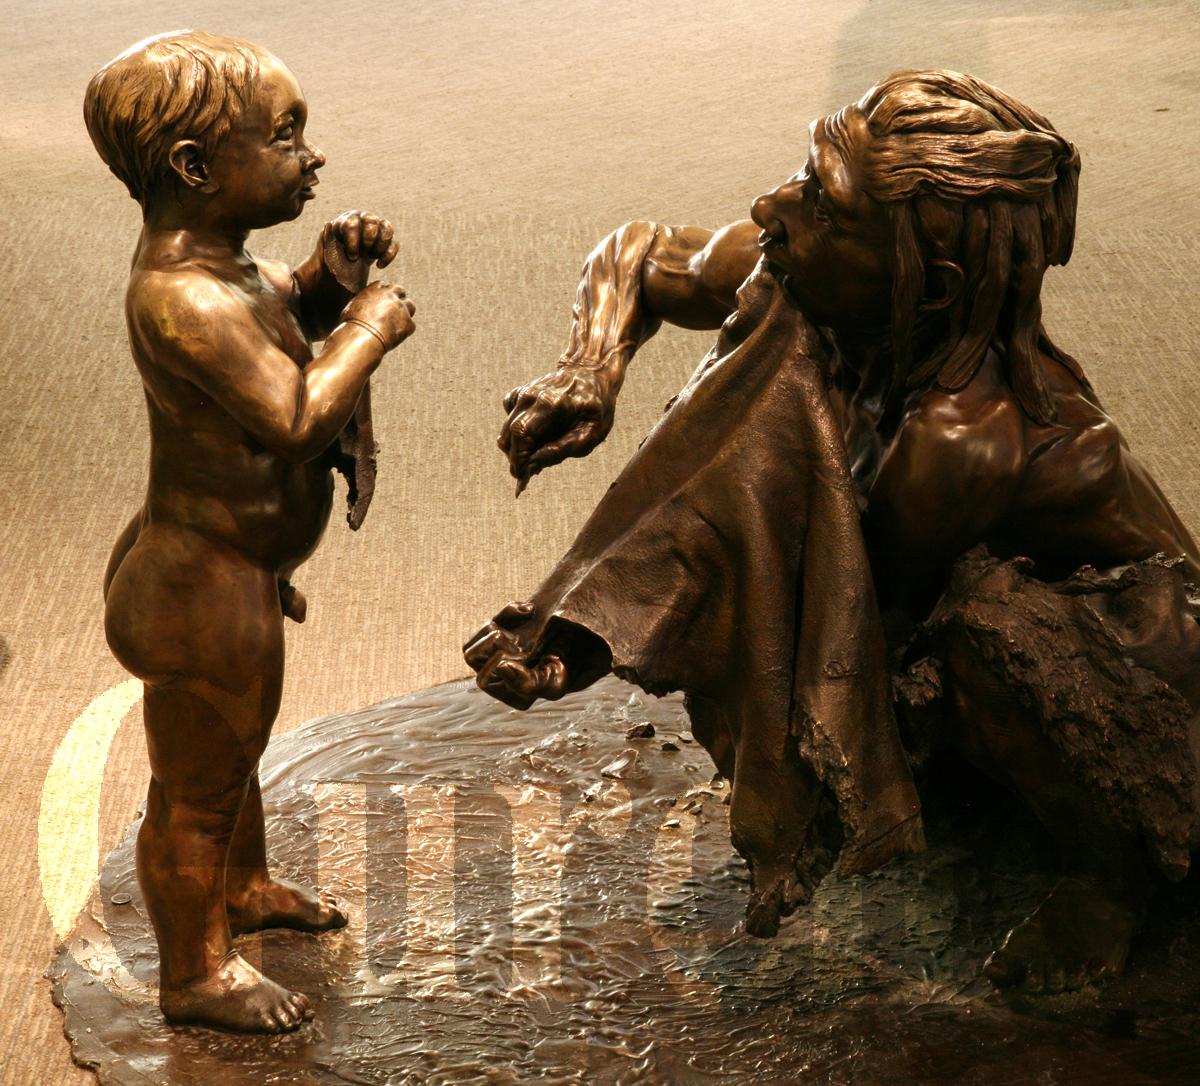 Image 801 Neandertal mother and child Smithsonian bronze.jpg